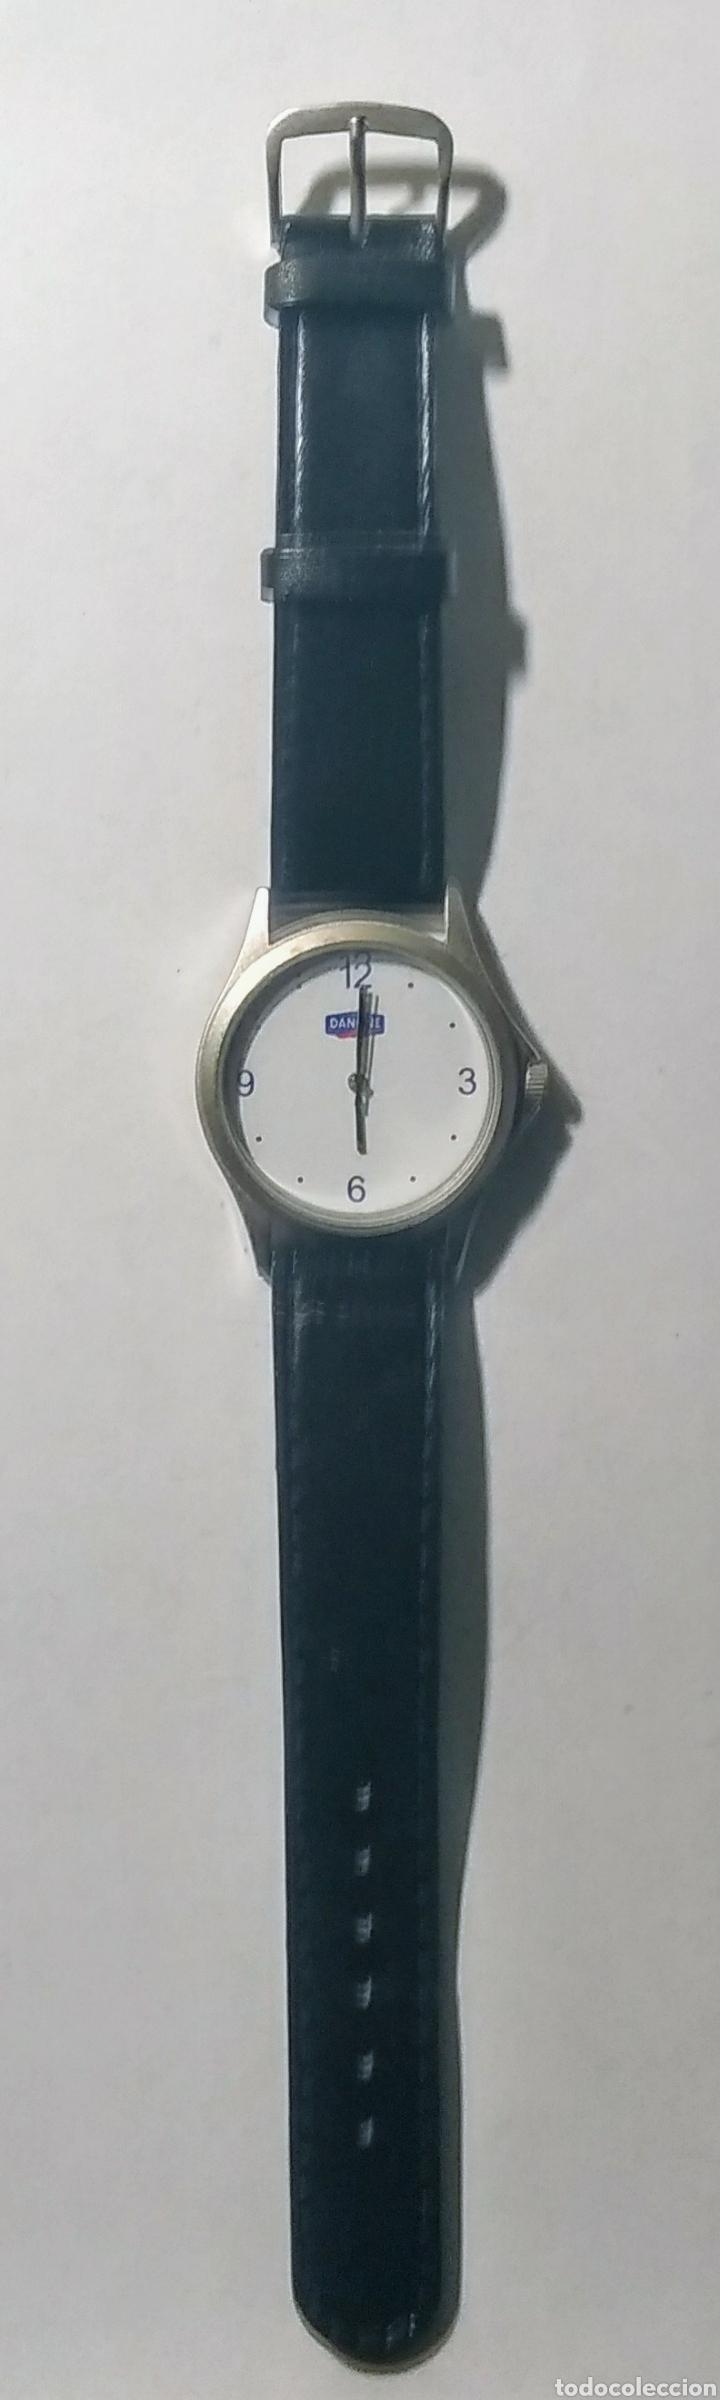 Relojes: Reloj de pulsera. Marca Danone. 1996 - Foto 2 - 186243338